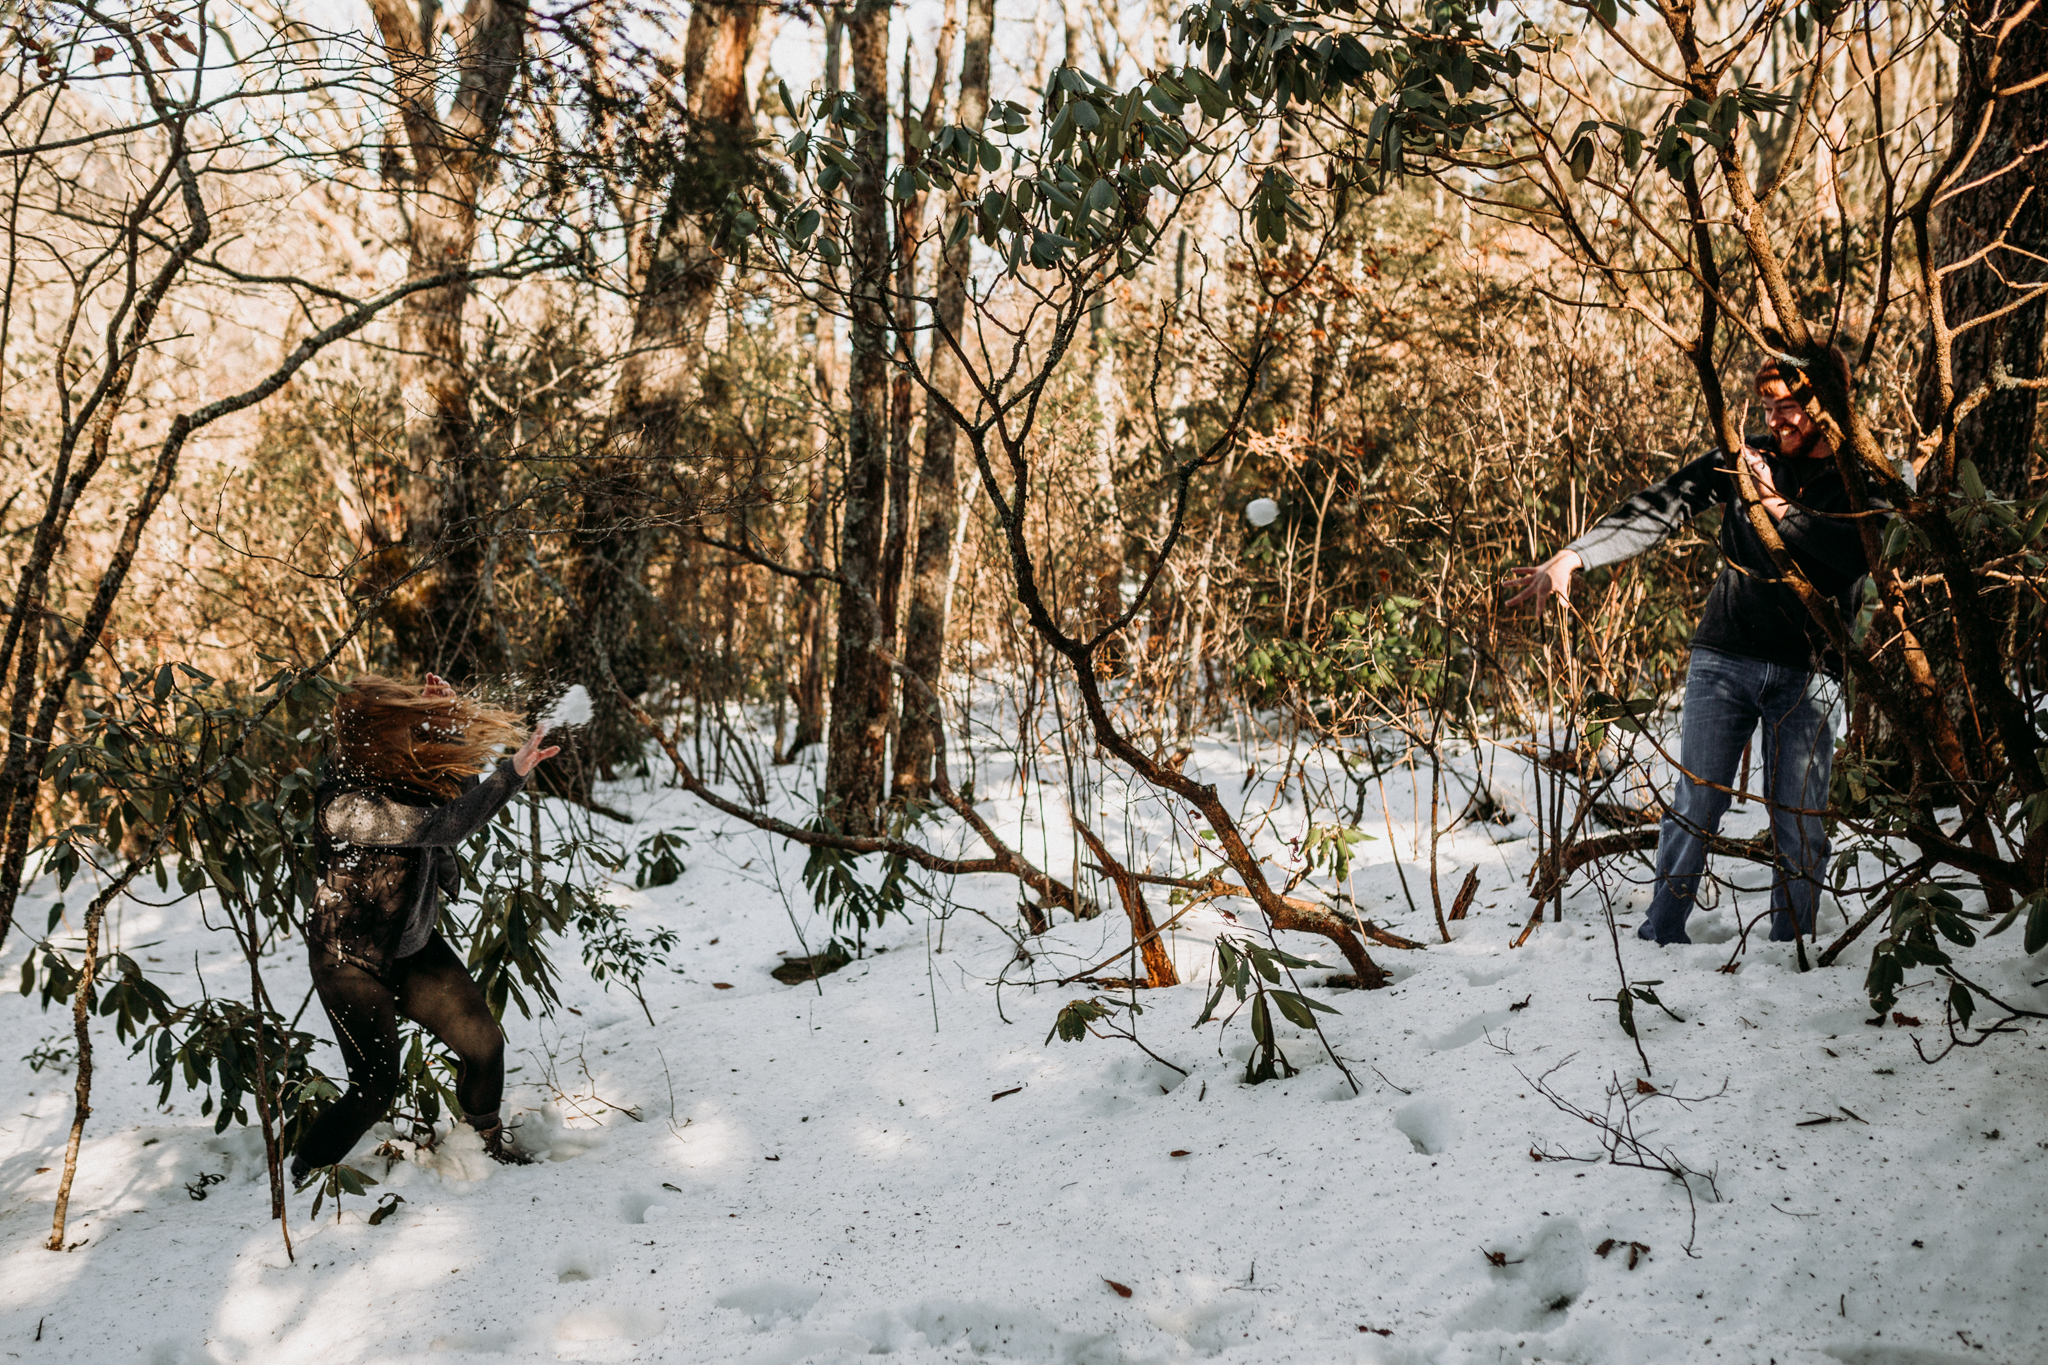 MonicaLeavellPhoto-AshleyMitch-NorthCarolina-Adventure-Engagement-Photographer-13.jpg